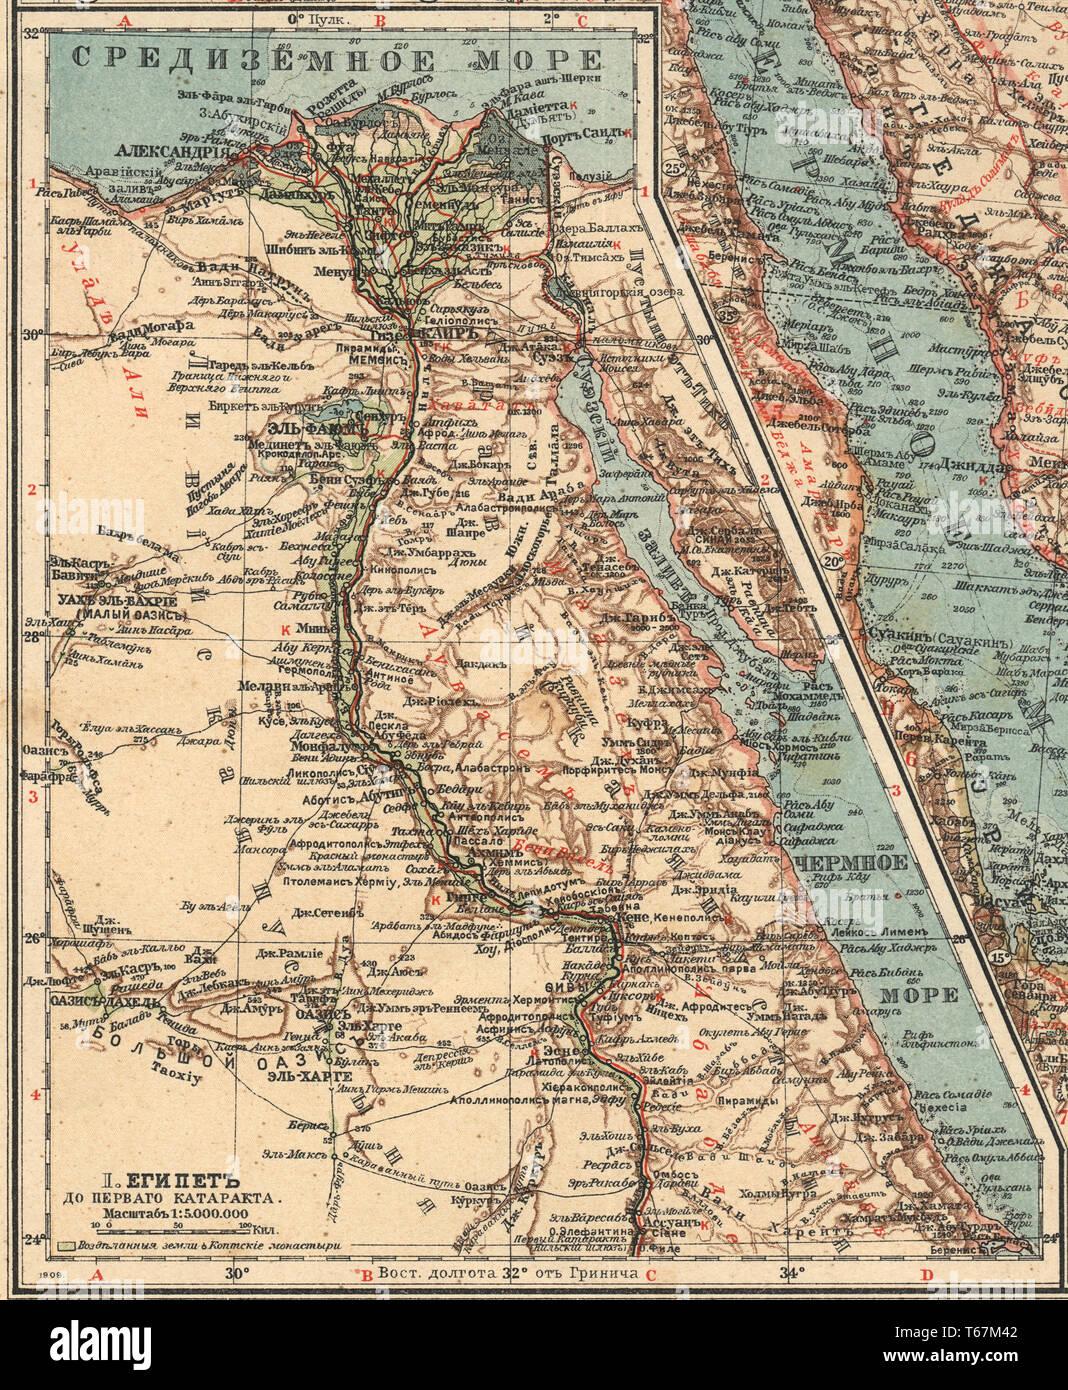 Map Of The Suez C Stock Photos & Map Of The Suez C Stock ... Zoomed Map Of Af on map of air force bases overseas, map of asia, map of sz, map of re, map of afr, map of africa, map of ic, map of ke, map of ta, map of ggc, map of mh, map of sh, map of spangdahlem air force base, map of cl, map of gl, map of ci, map of afganis, map of gh, map of sn, map of ei,